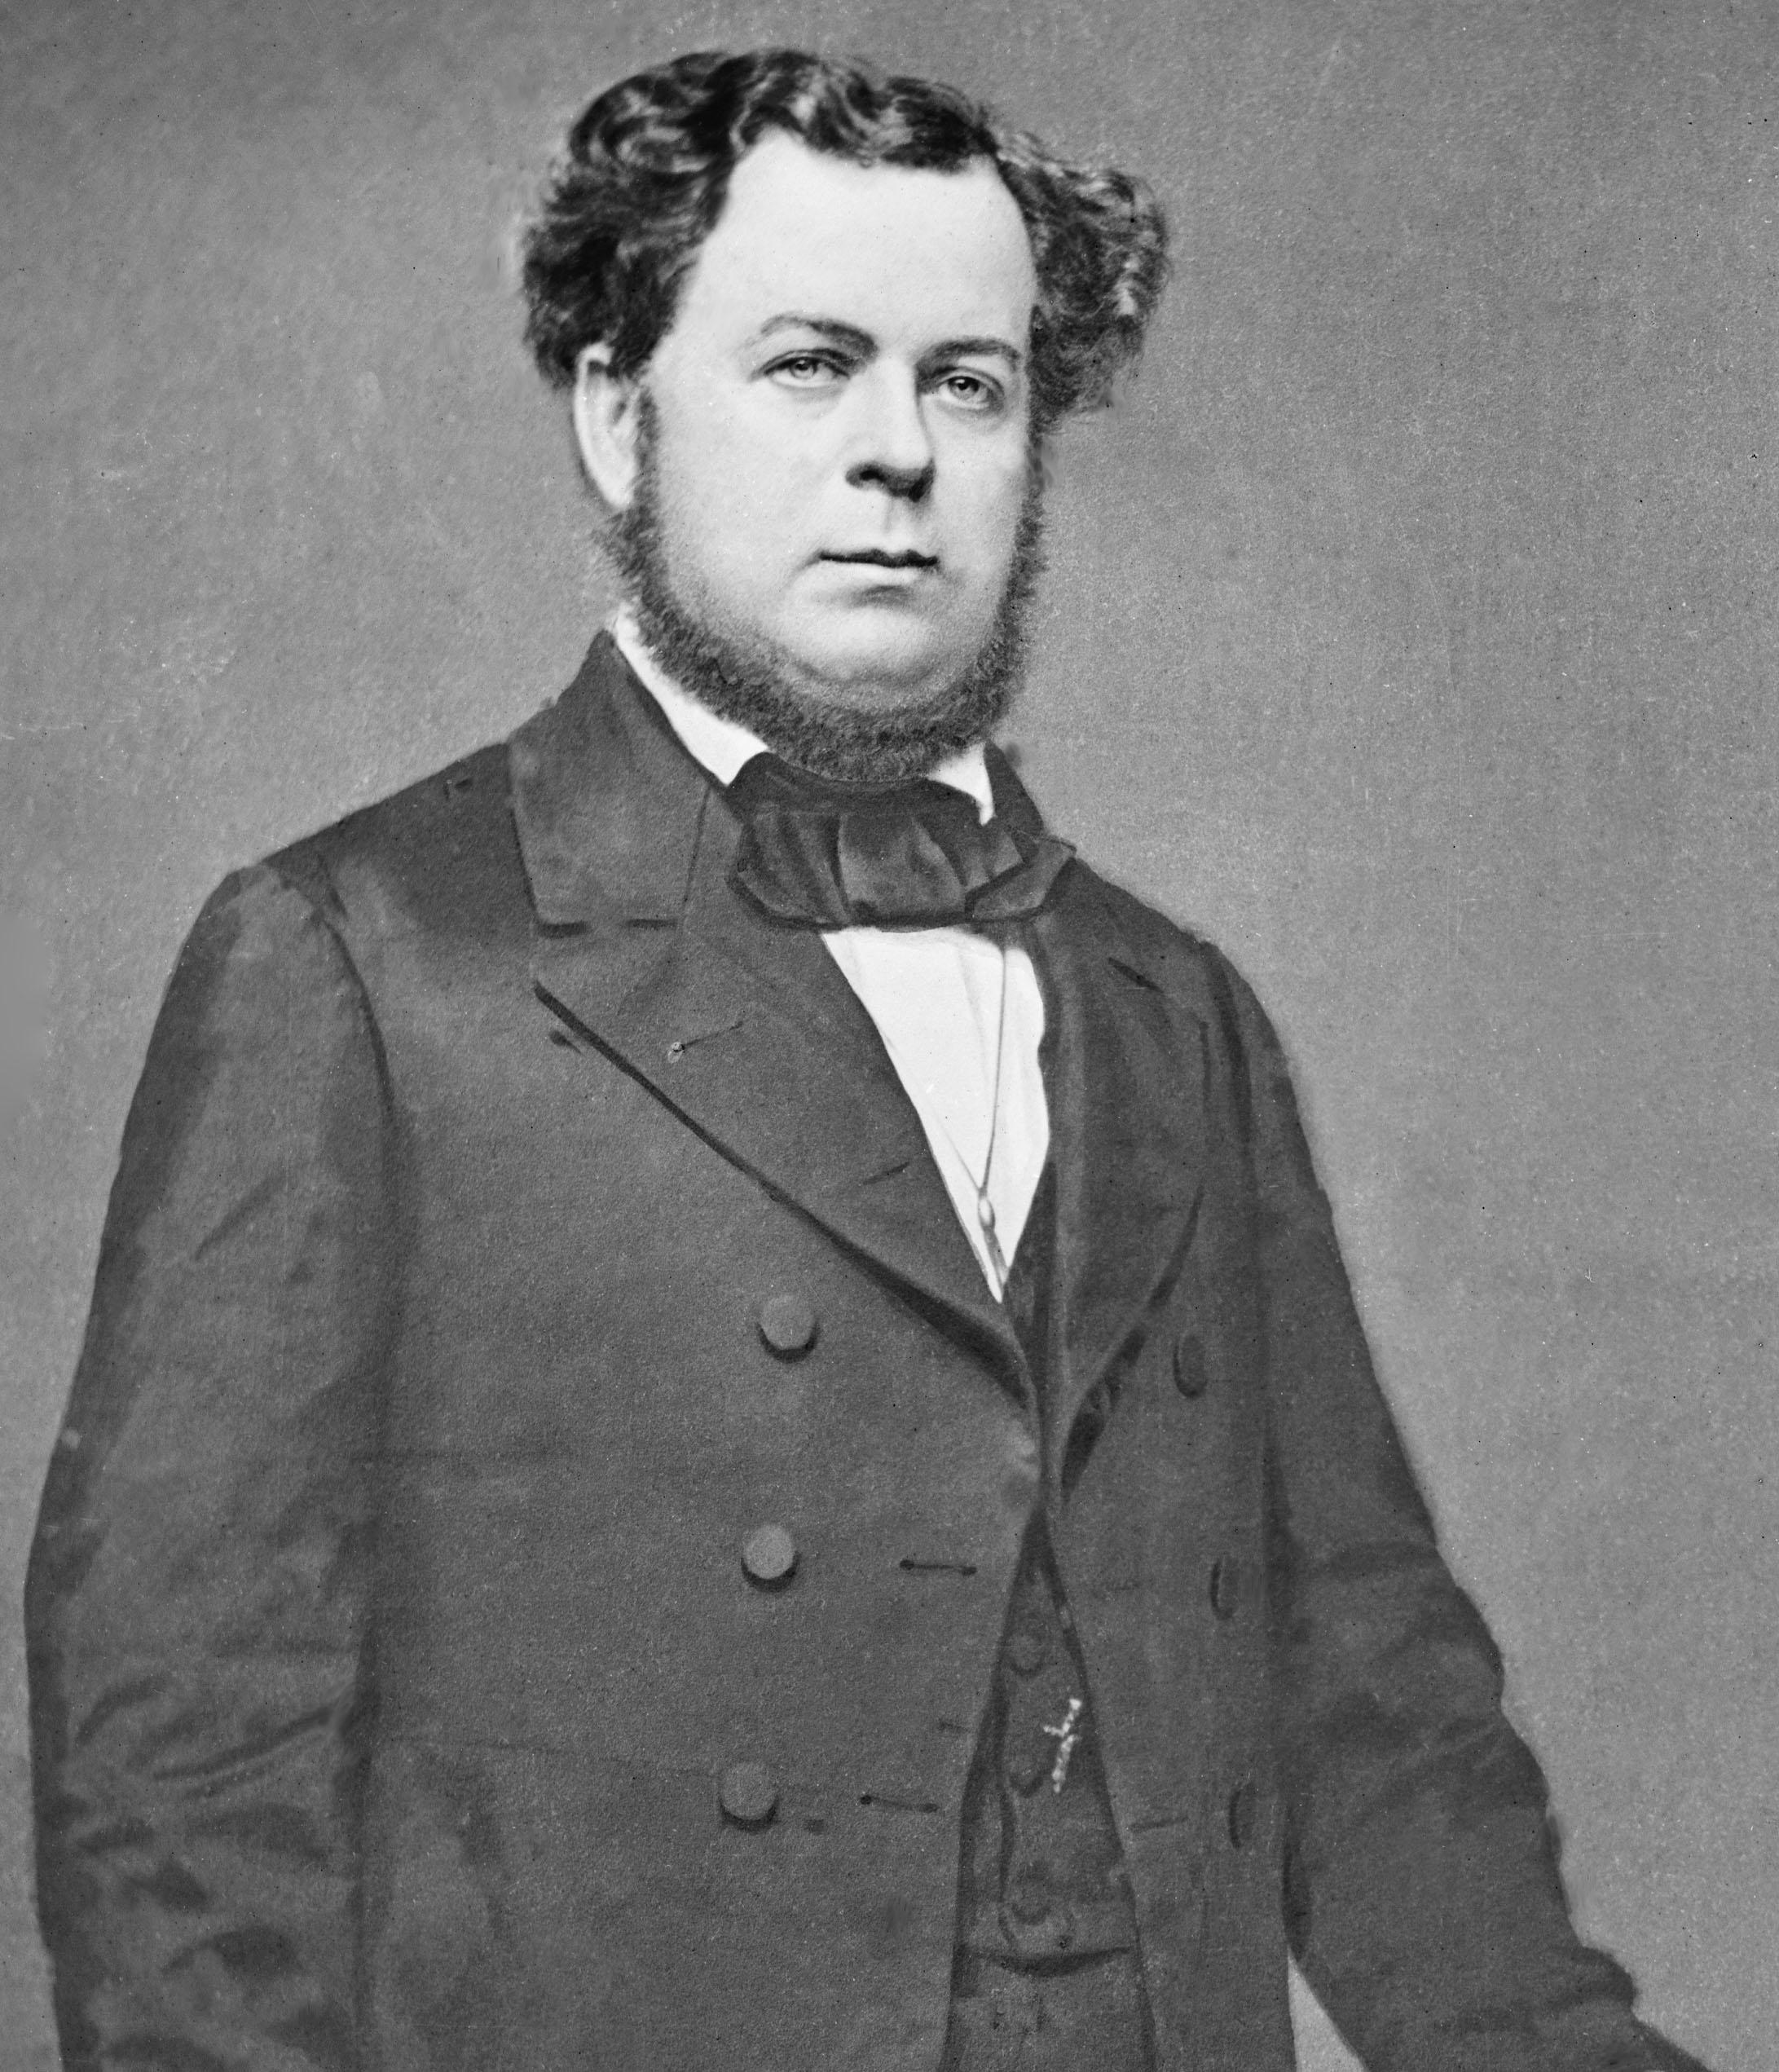 portrait of Stephen R. Mallory, Secretary of the Navy